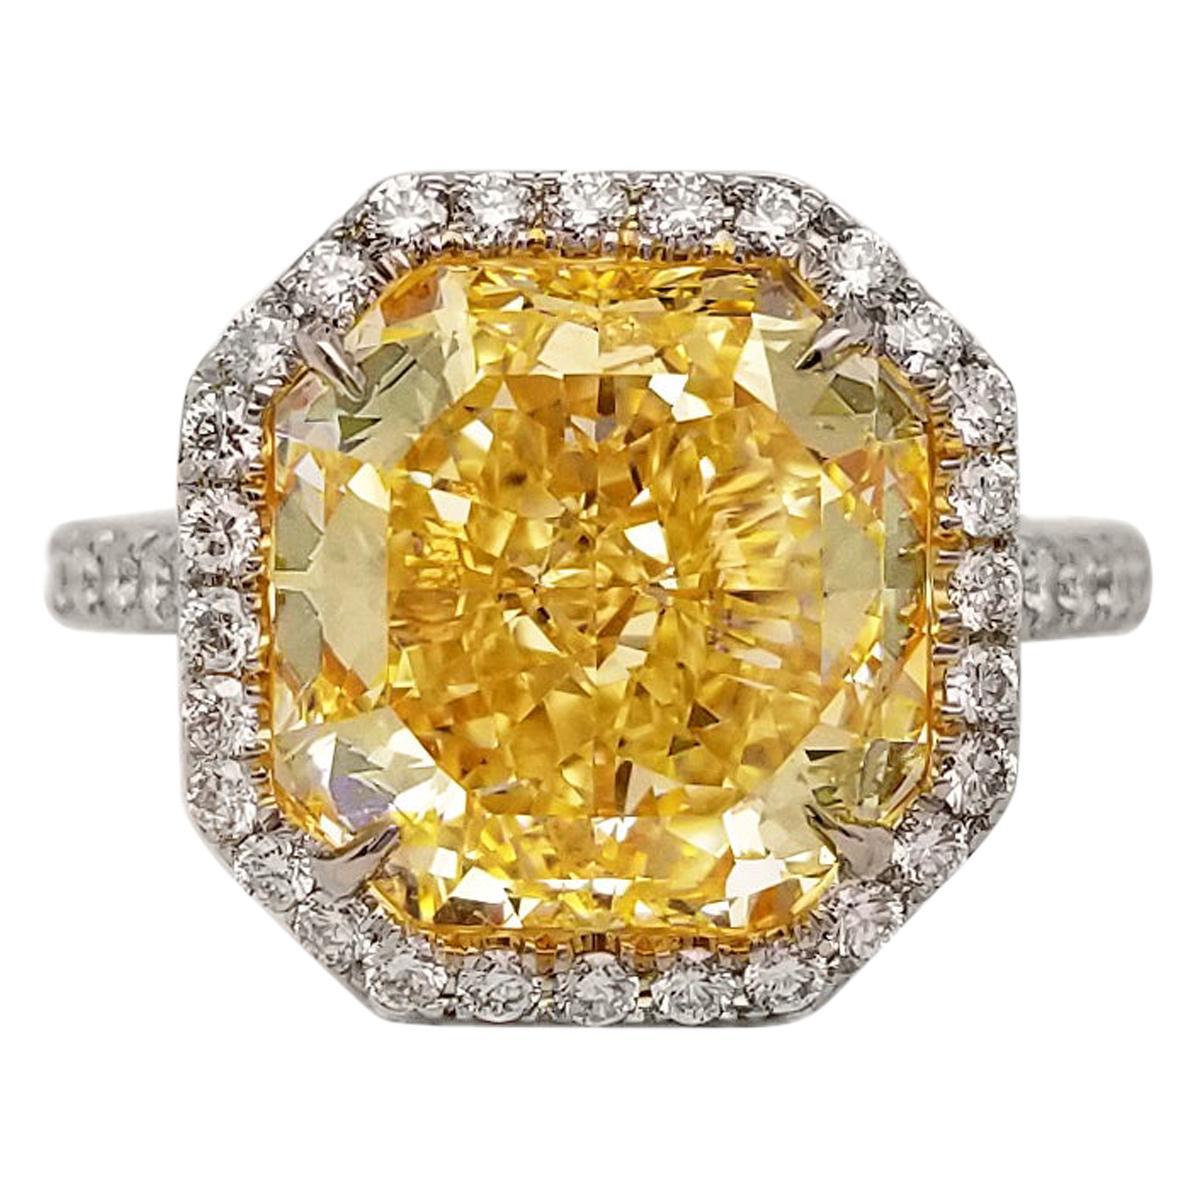 Scarselli 6 Carat Fancy Yellow Diamond Ring in Platinum